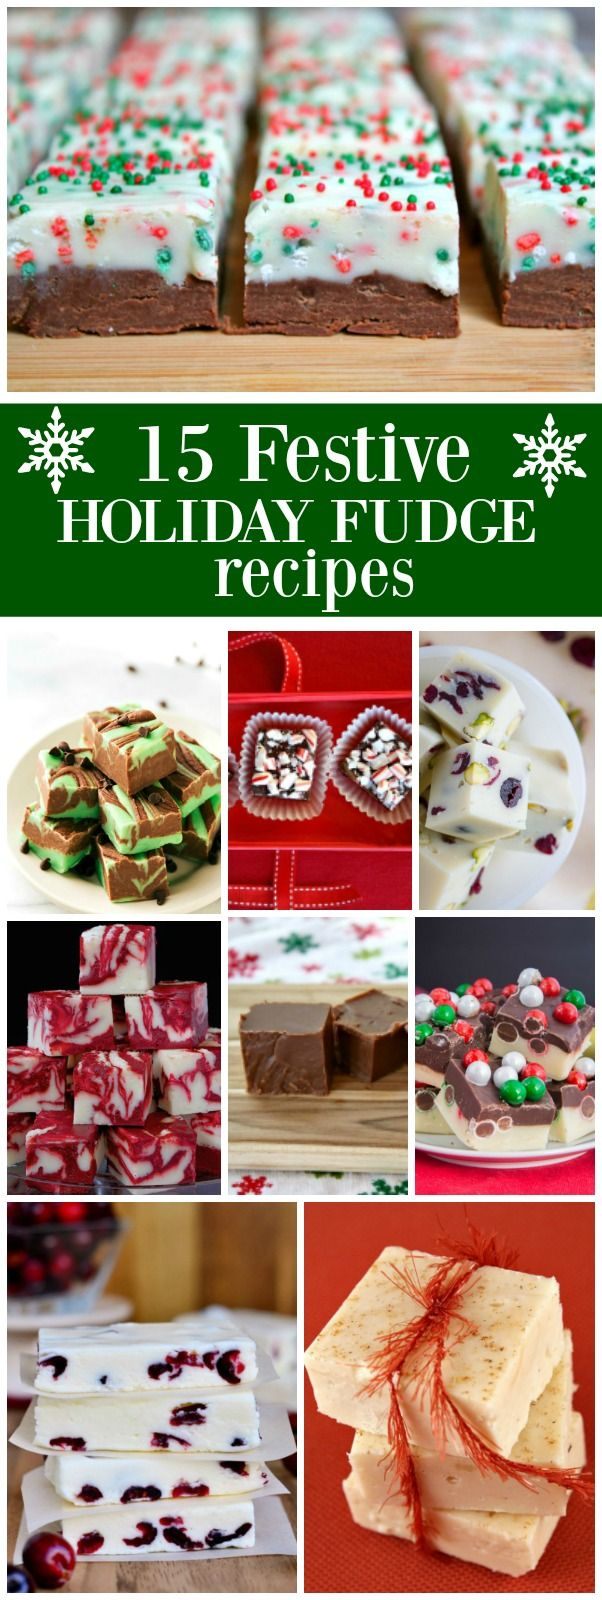 15 Festive Holiday Fudge Recipes: Eggnog Fudge, Gingerbread Fudge, Hot Chocolate…